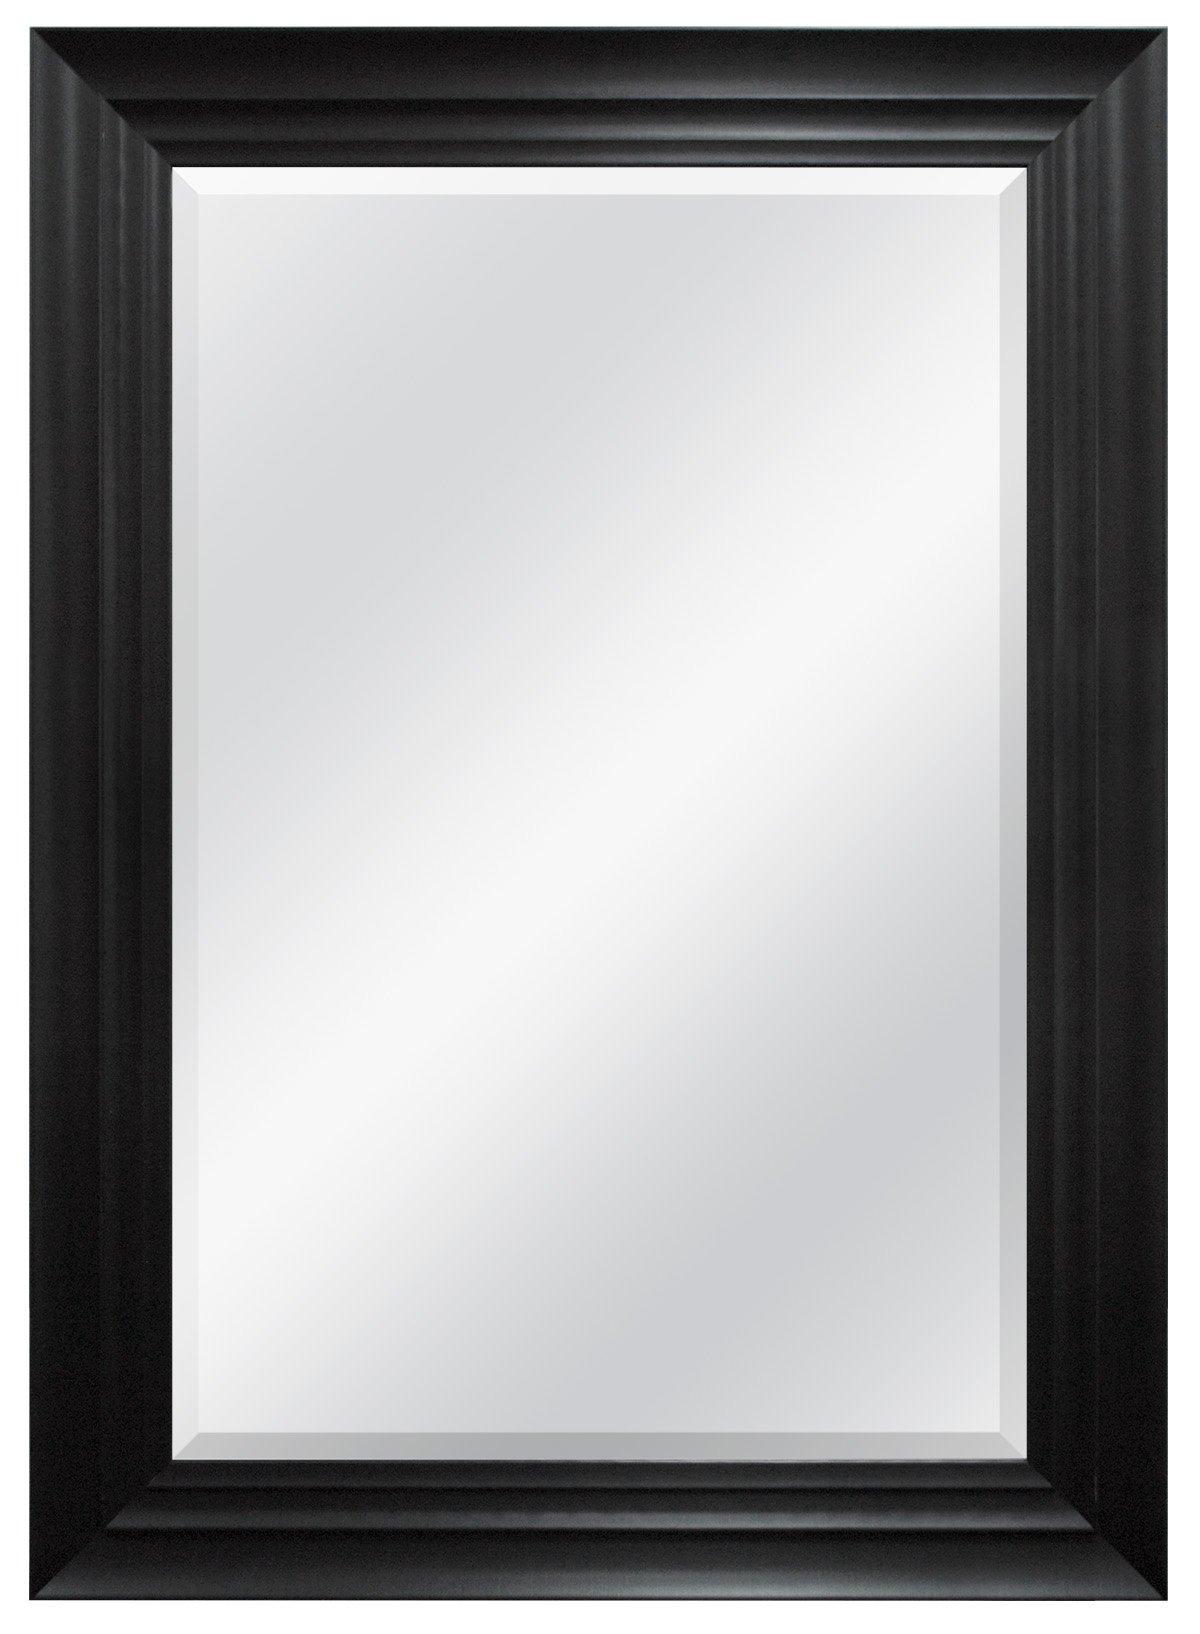 MCS 24x36 Inch Ridged Wall Mirror, 32x44 Inch Overall Size, Black (47699)